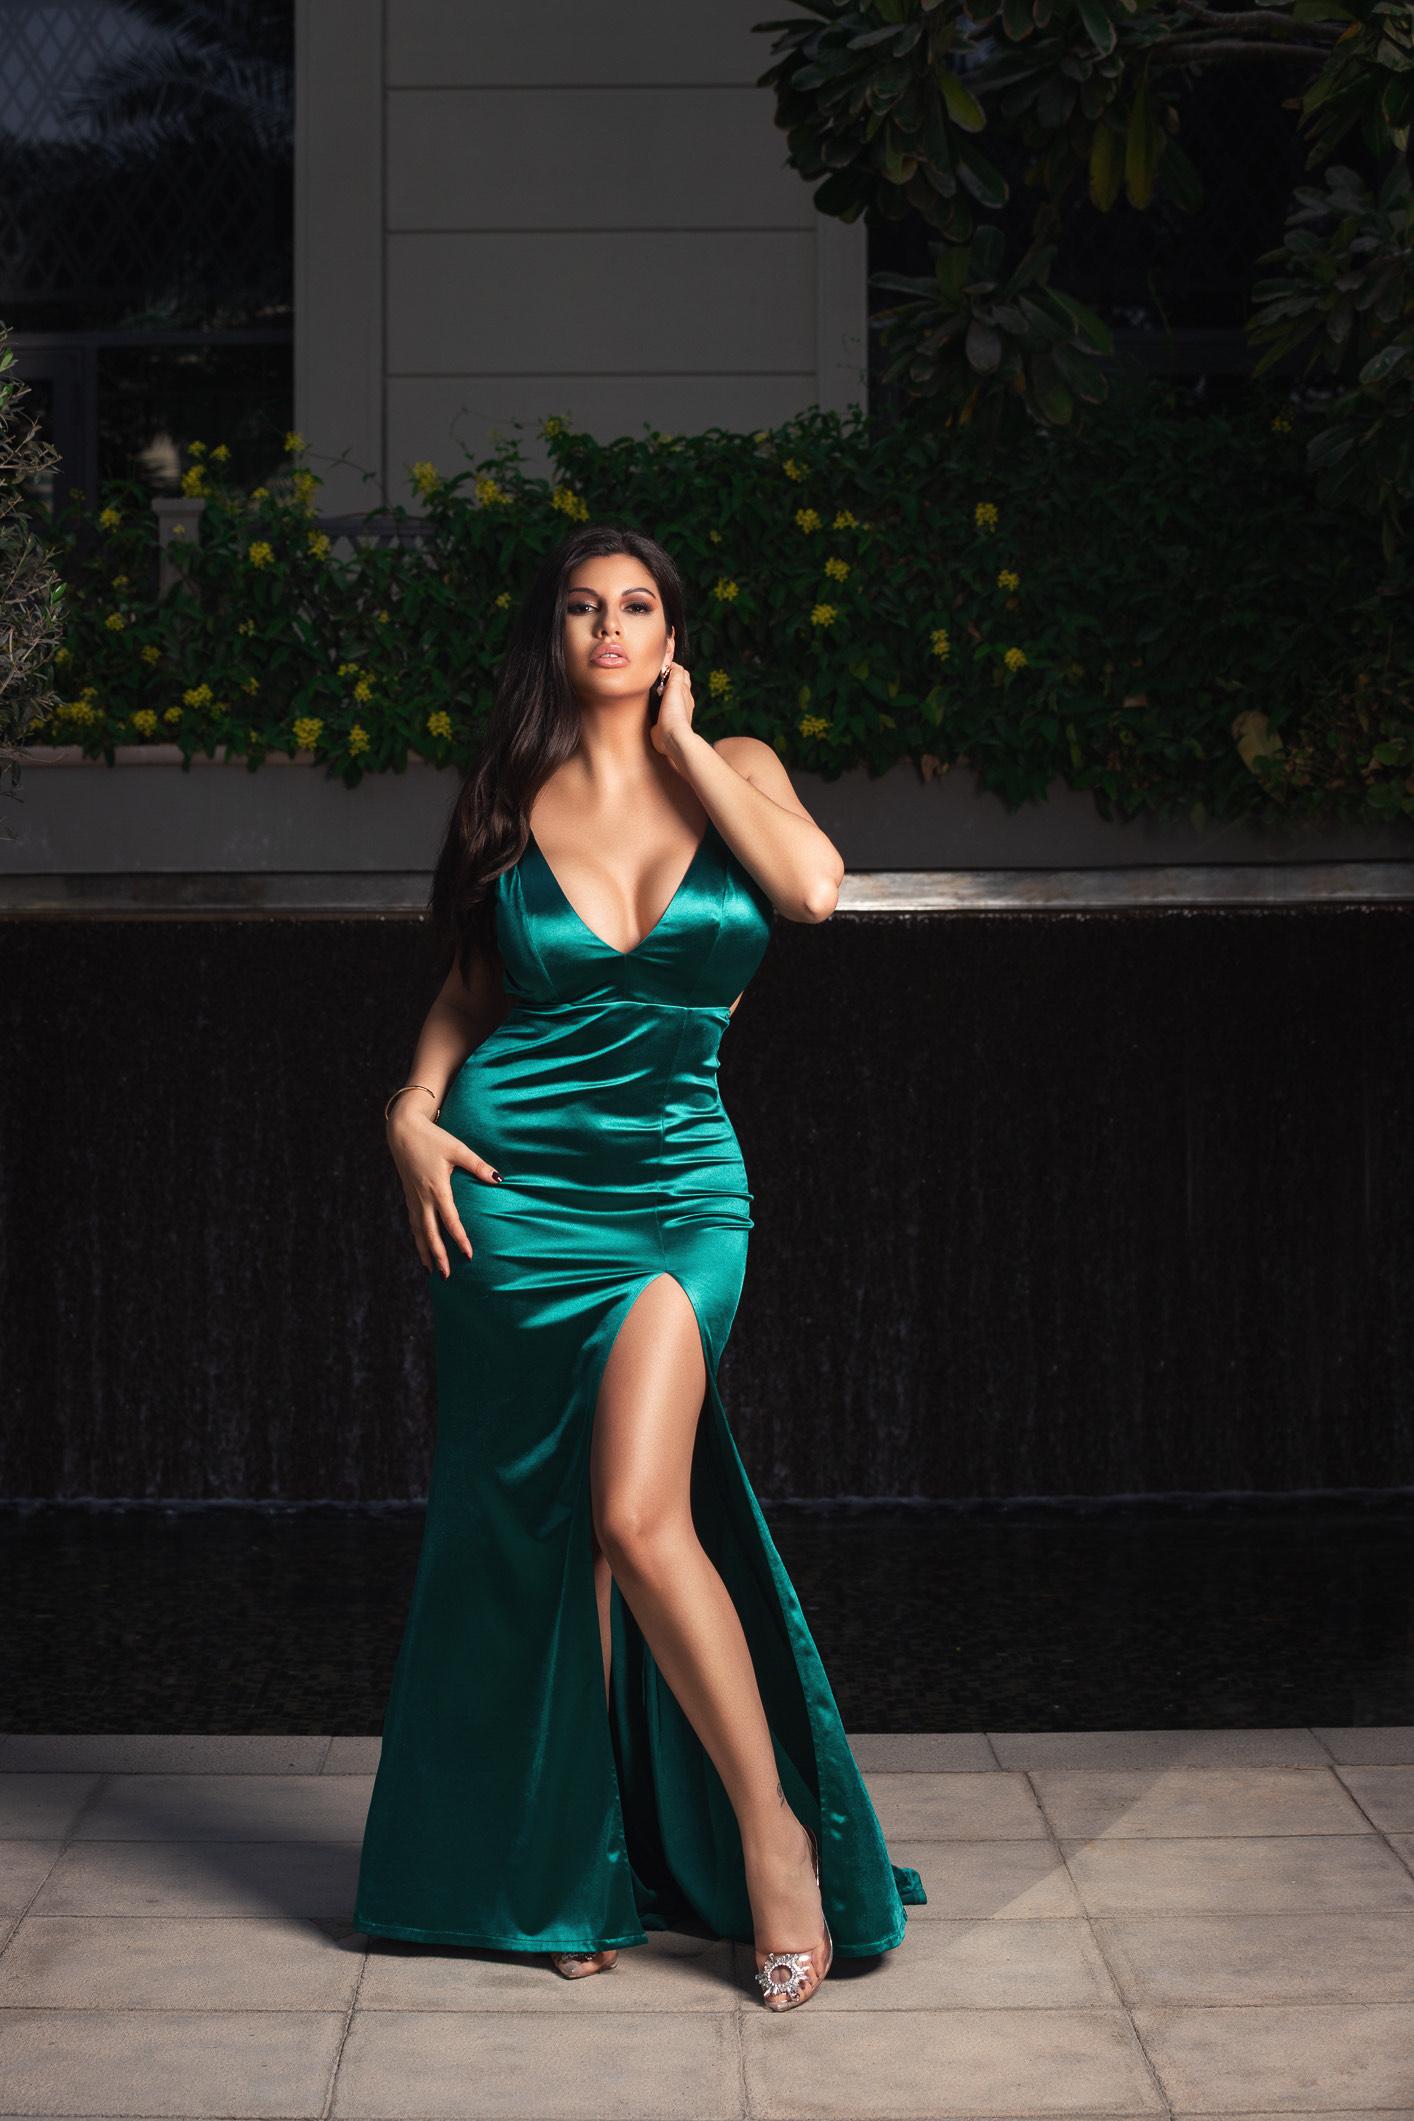 Dora Rodriguez wearing a Hi Maintenance dress